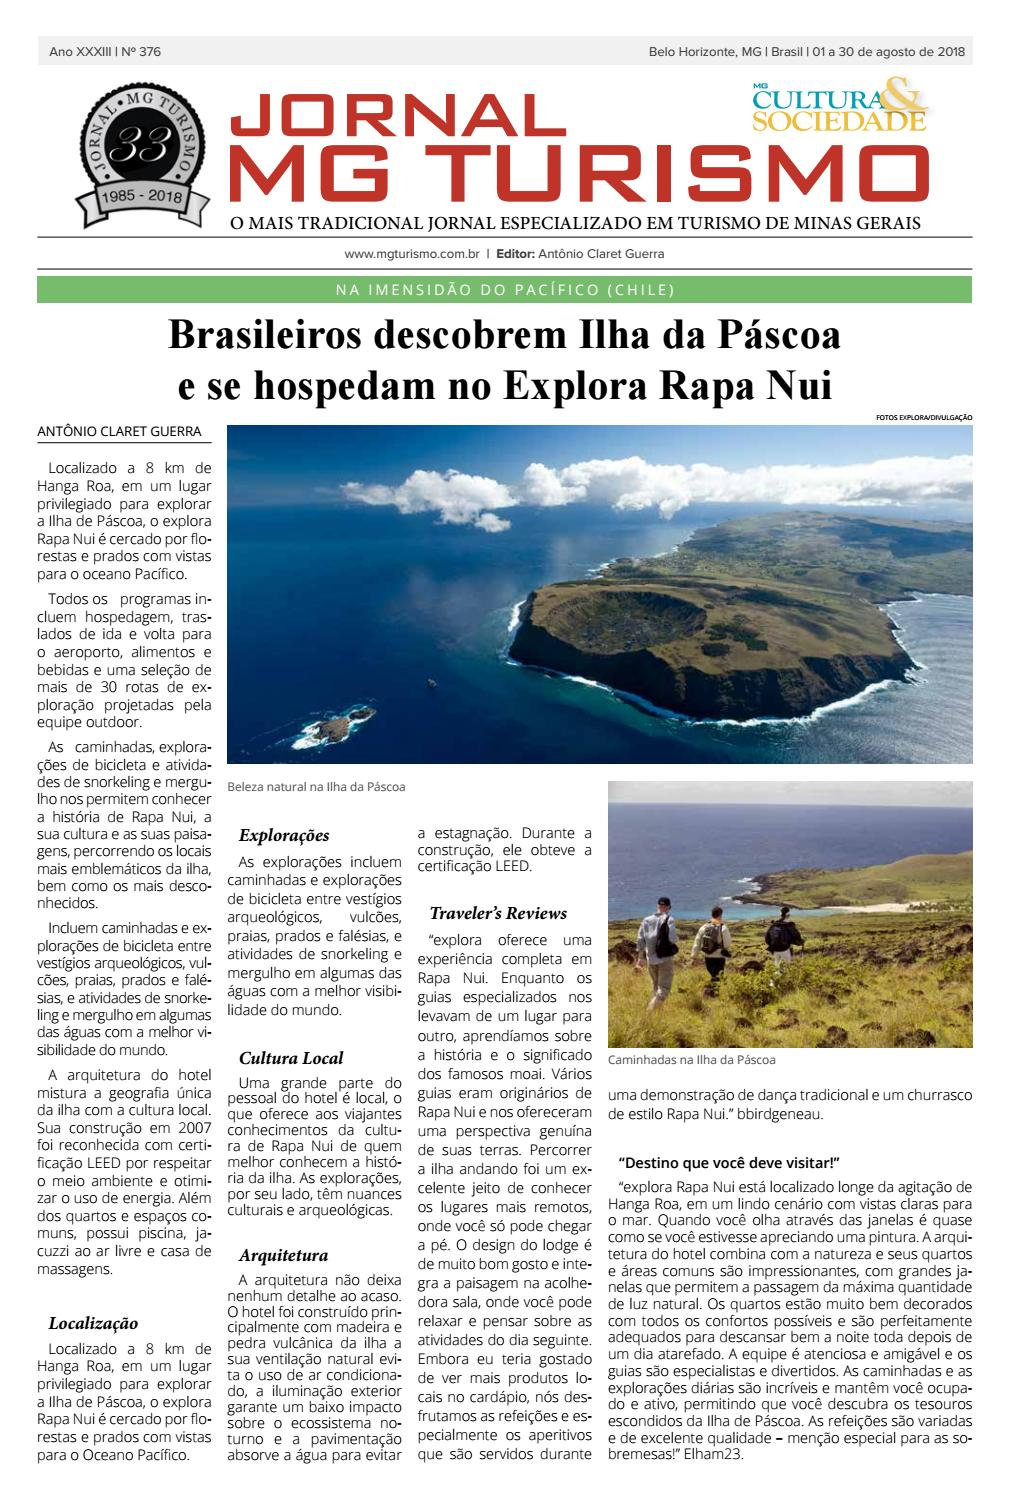 Jornal MG Turismo — Ano XXXIII — Número 376 — 1º a 31 de Agosto de 2018 by  Turismoria  João Zuccaratto - issuu d7593206dd8b8